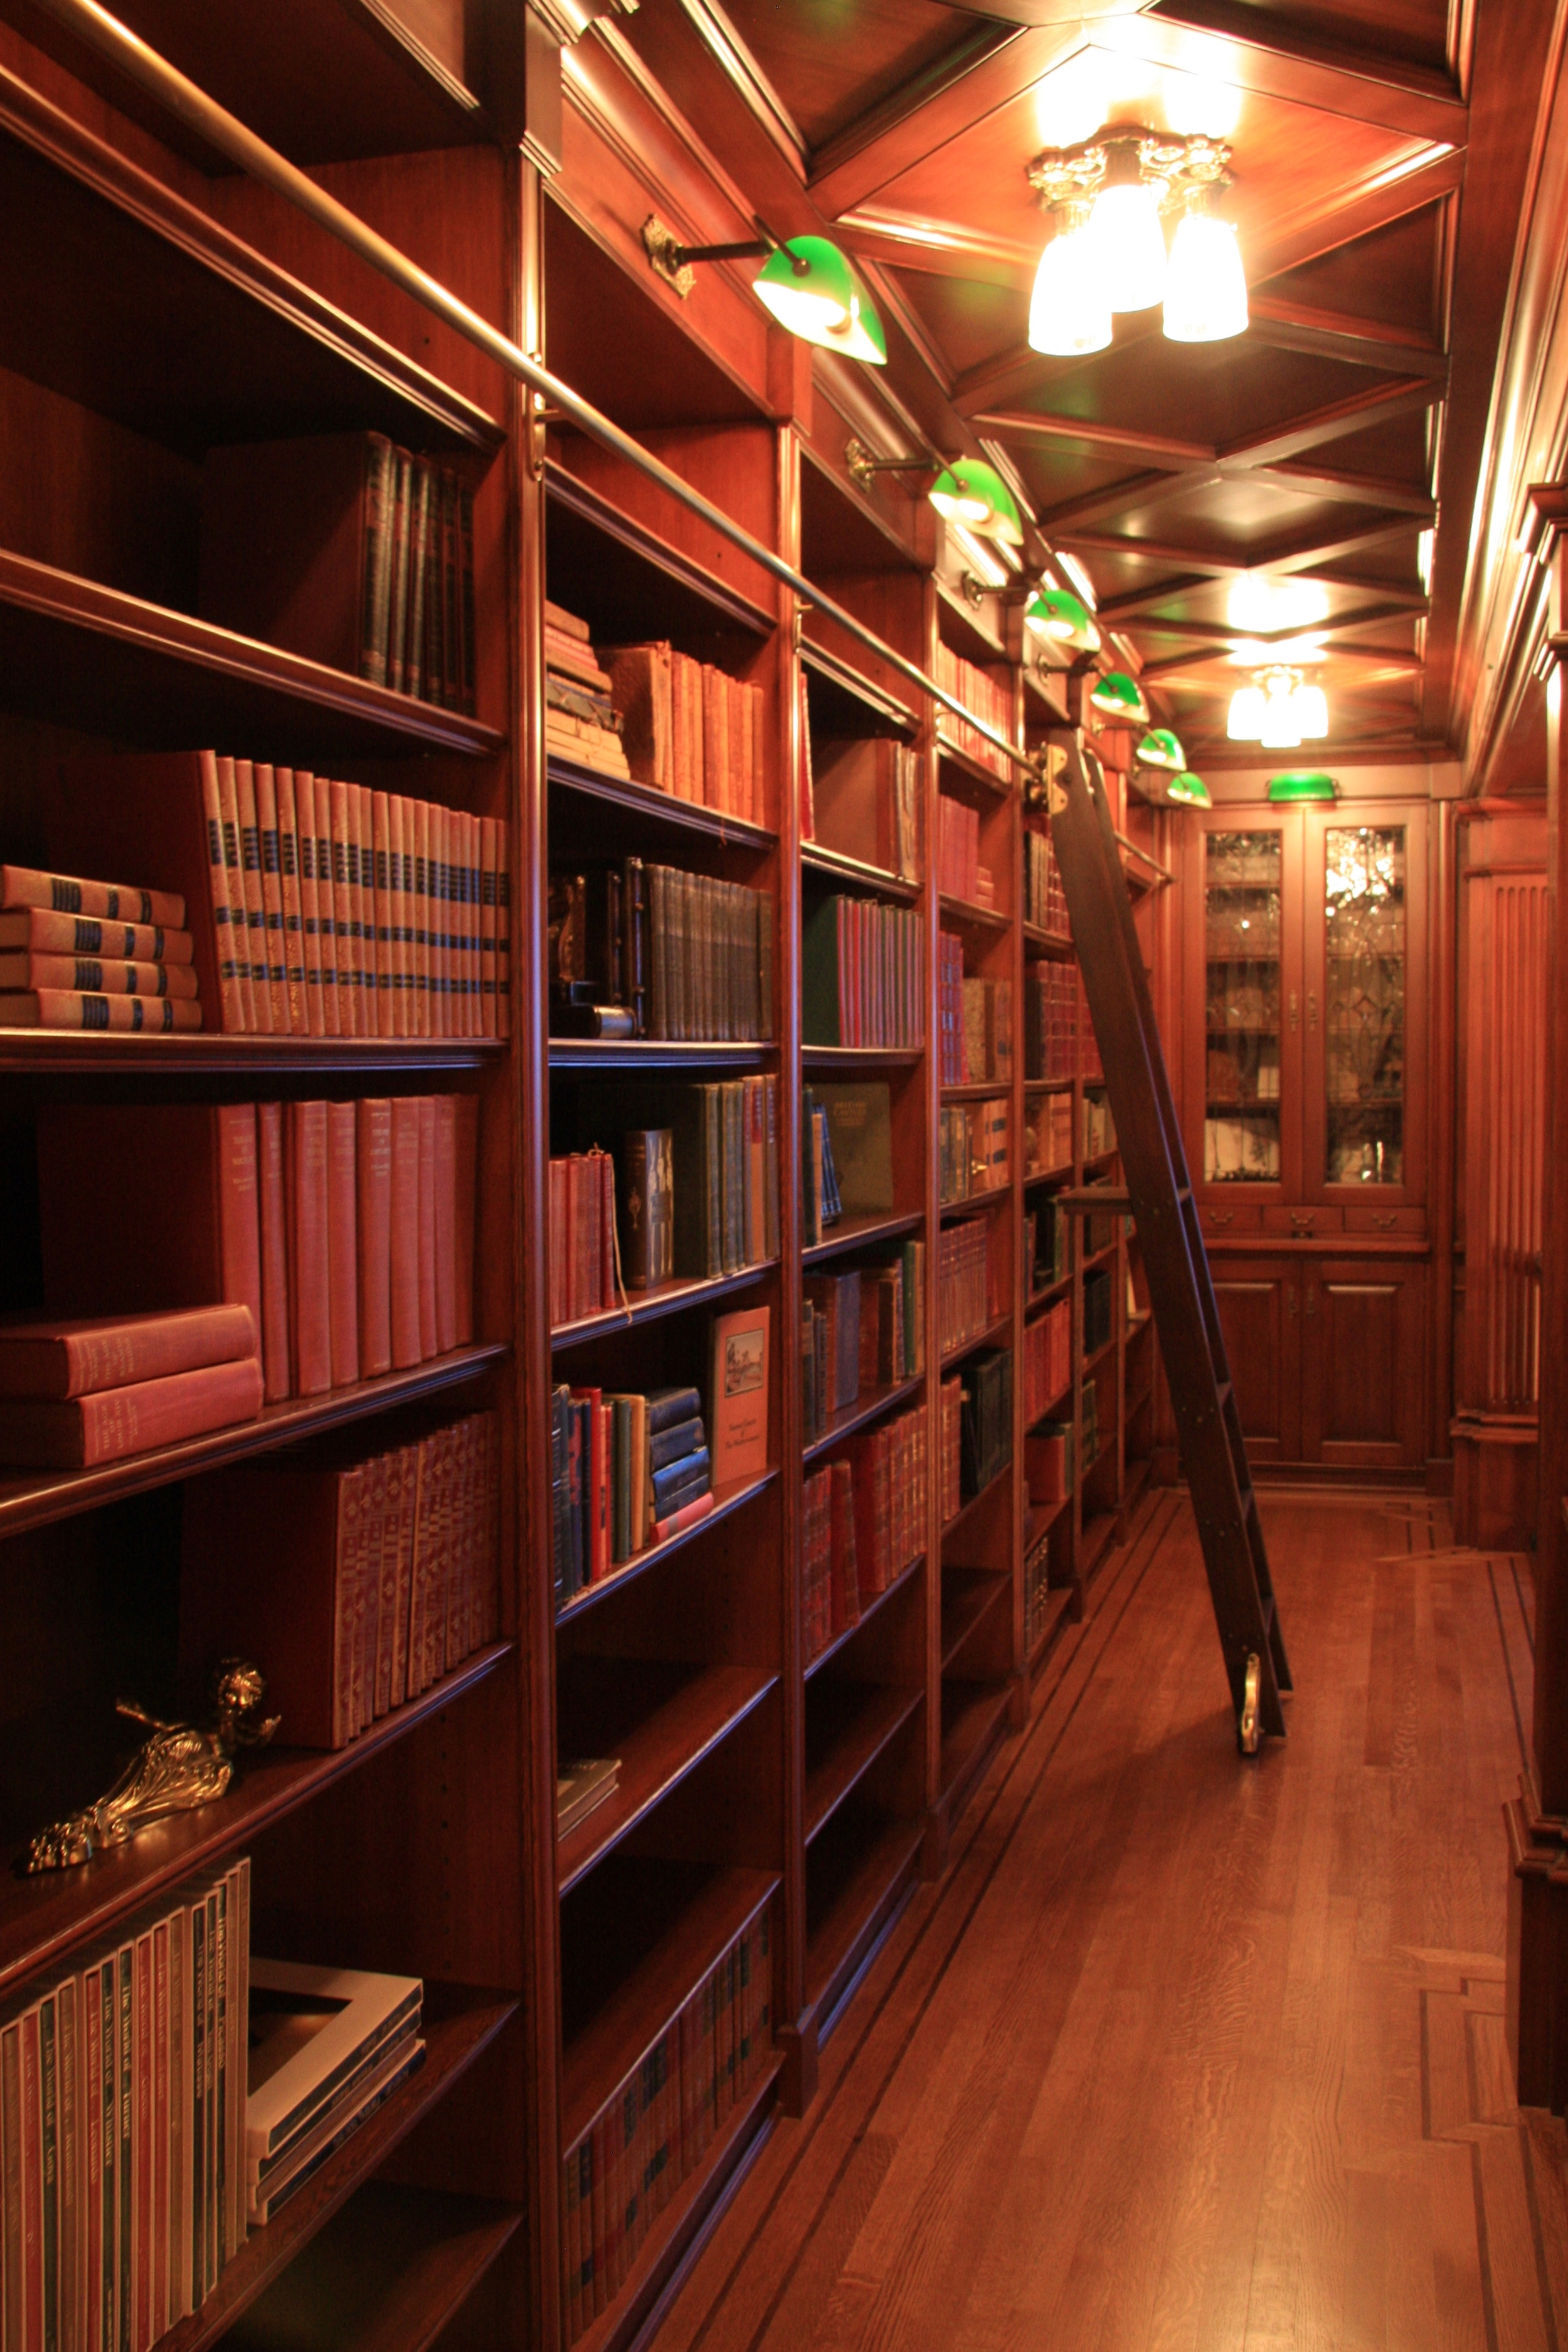 Burrows_Bookshelf